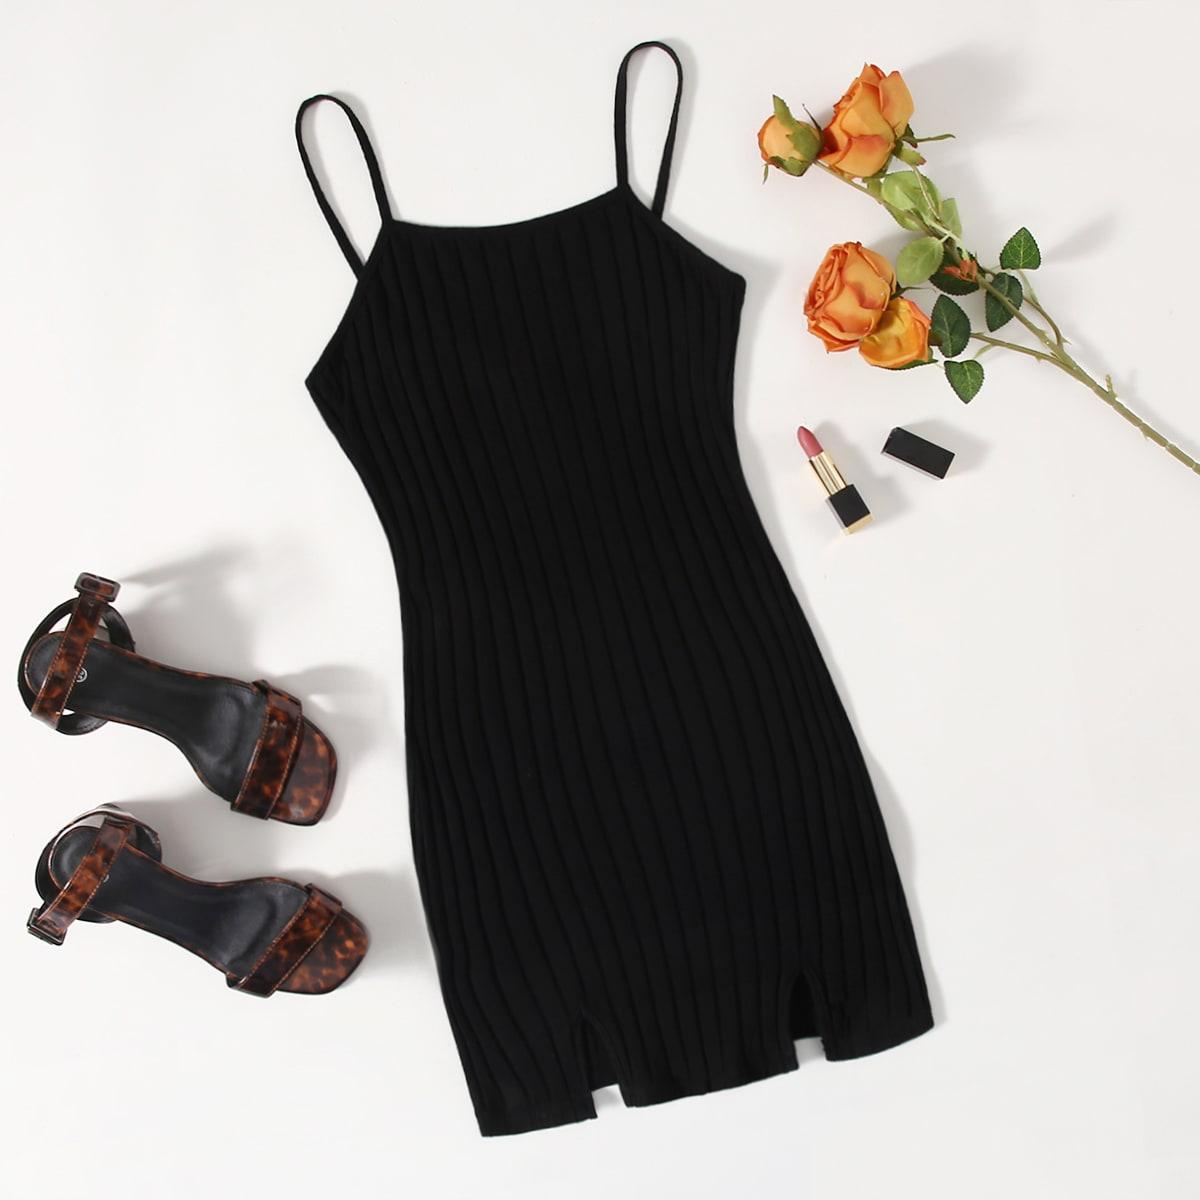 M-slit Rib-knit Bodycon Dress